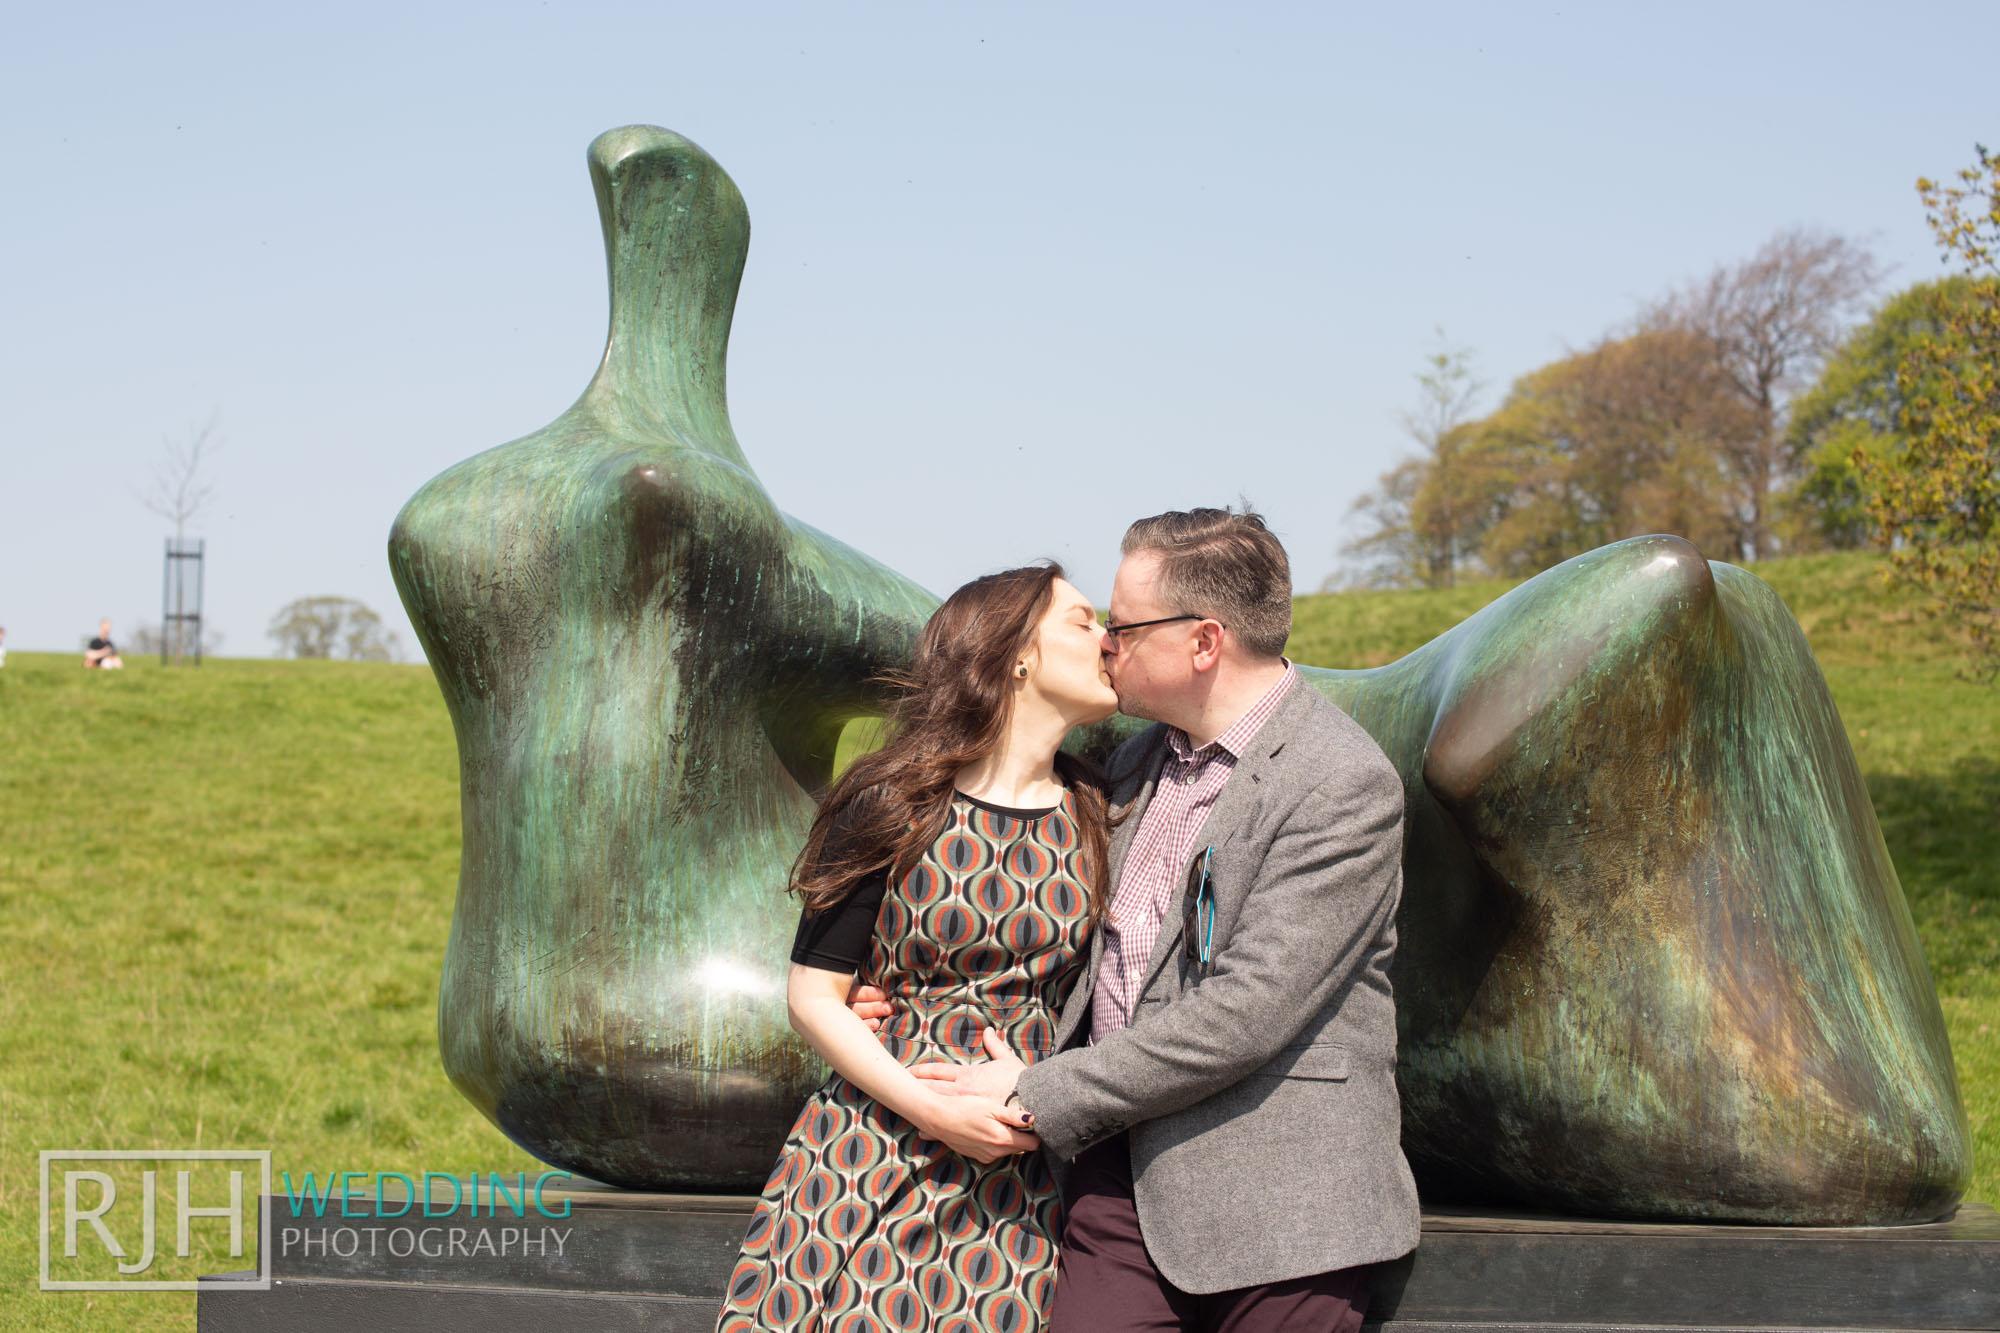 Pre-wedding photography - Richard & Rachel_036_3C2A8352.jpg